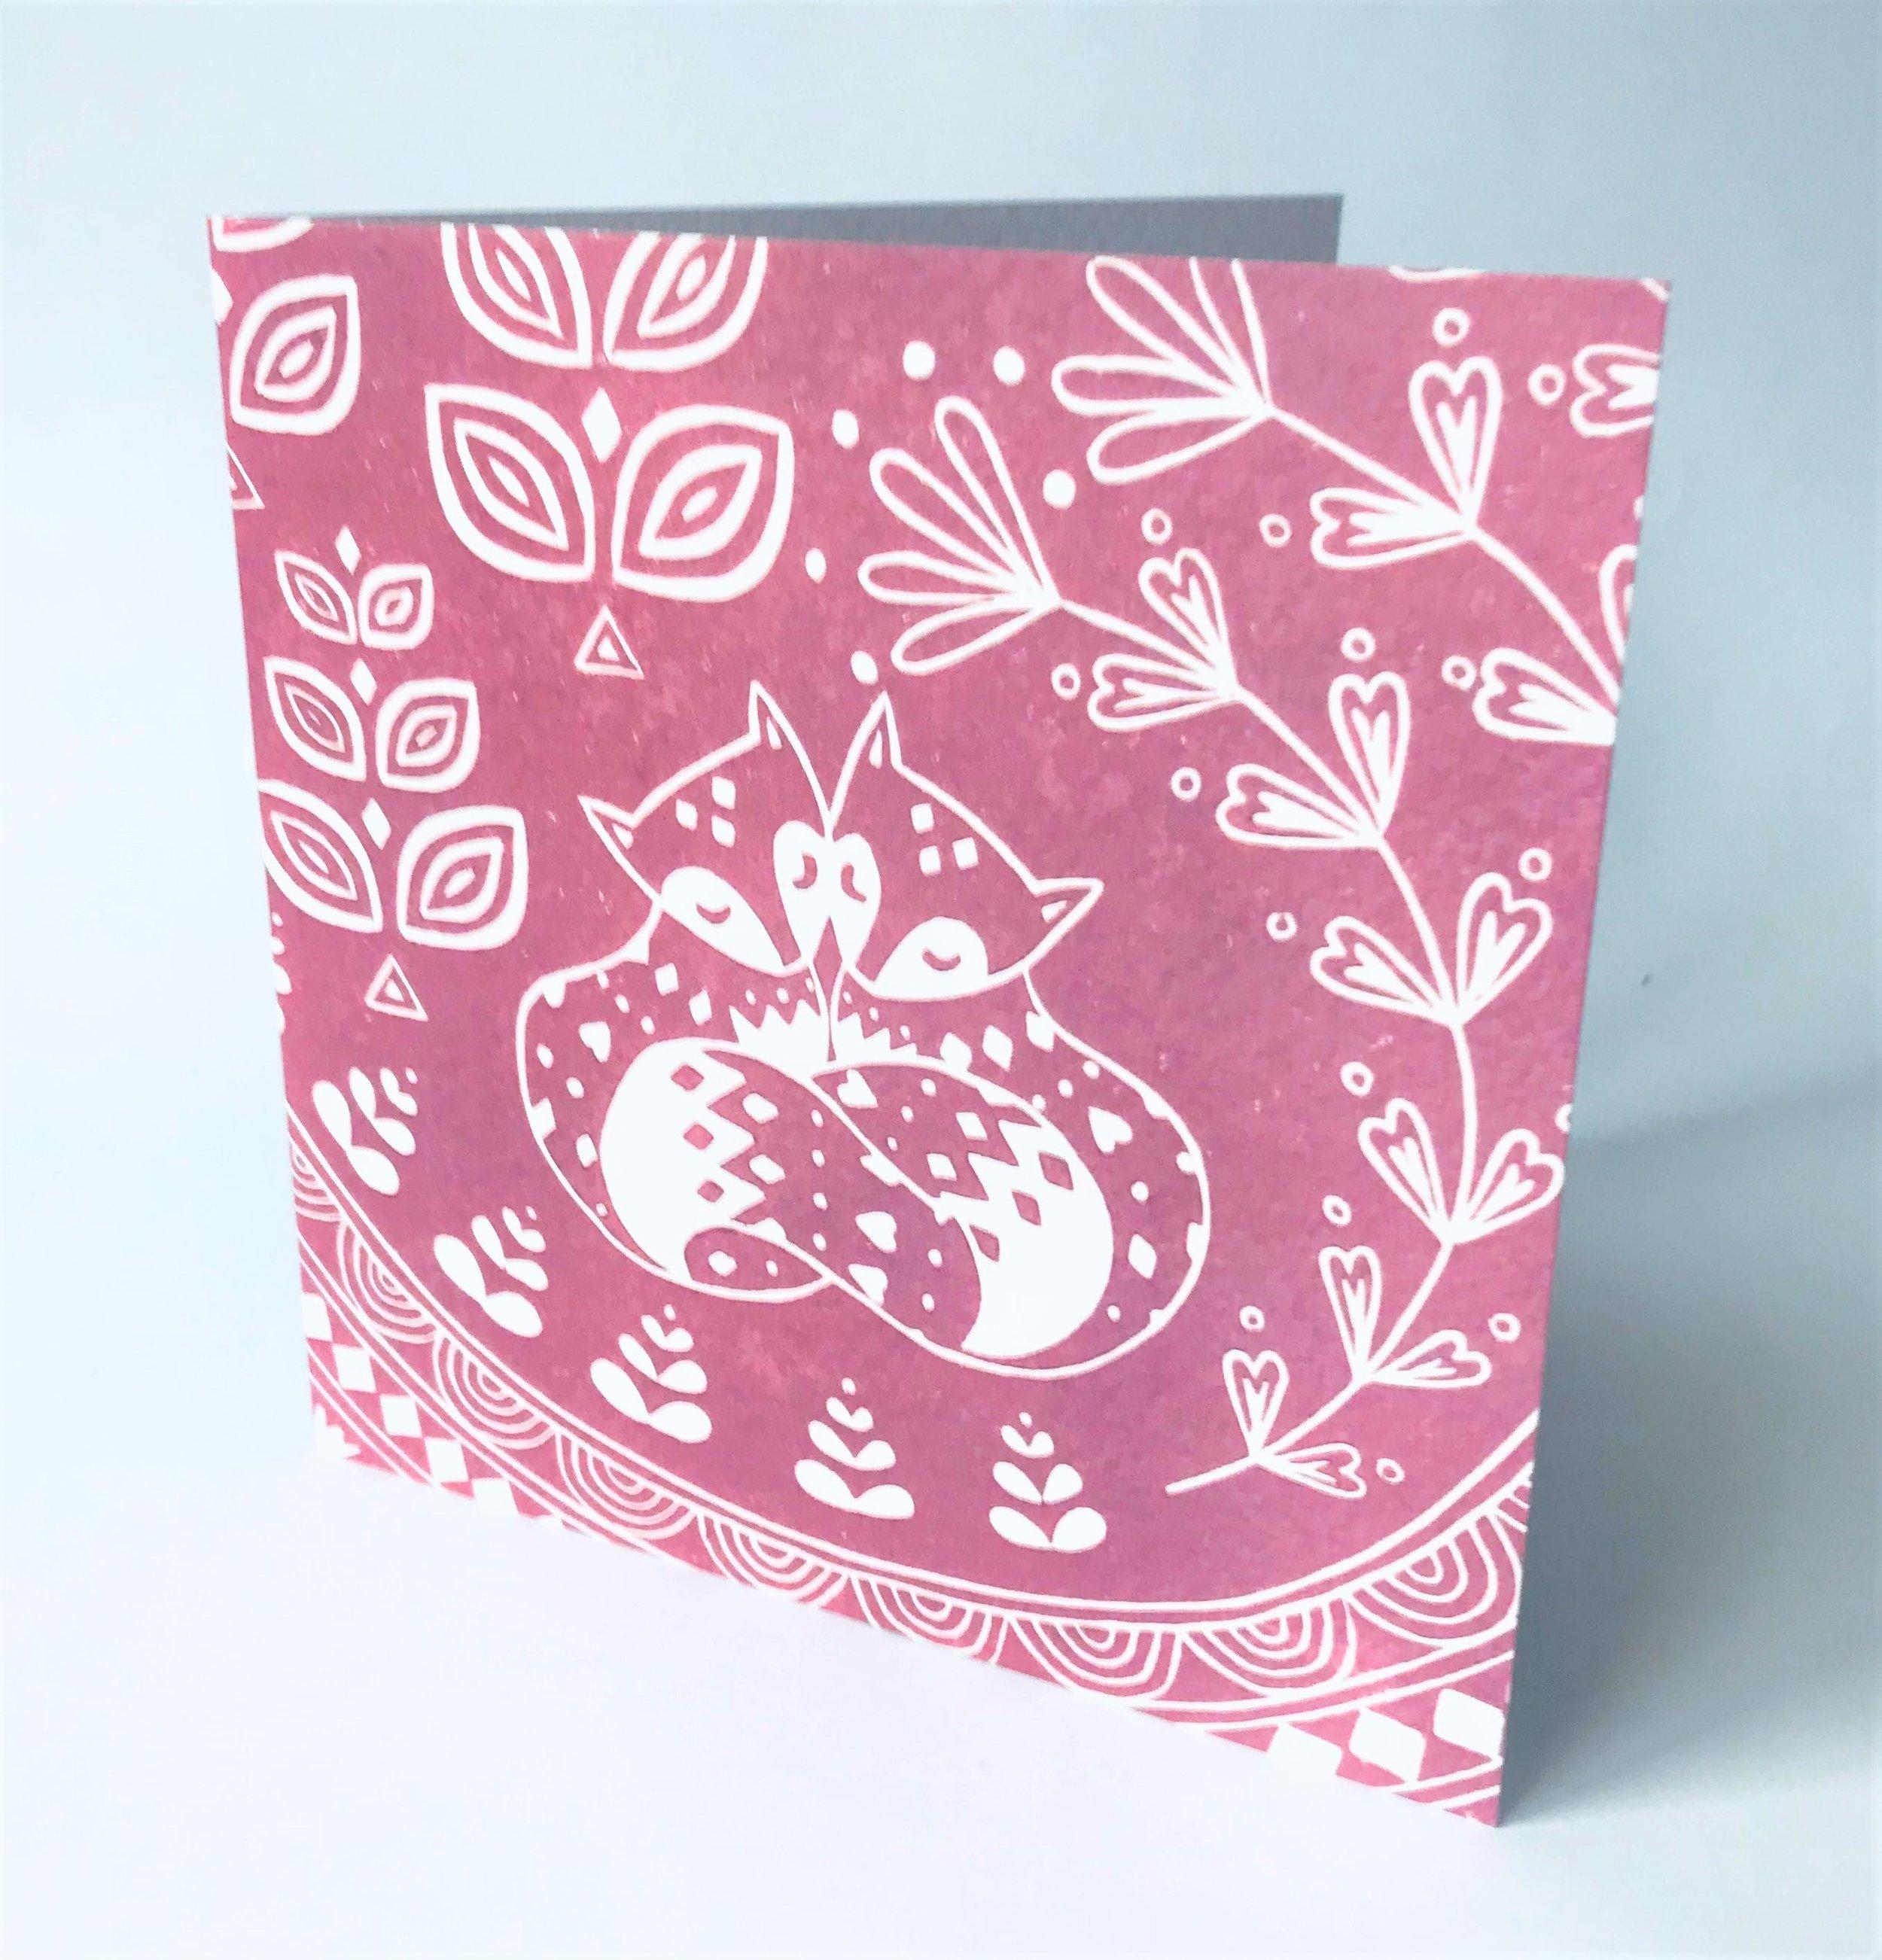 Daniel and Rosie Fox Dusky Pink  Card  15 x 15 cm  £2.50